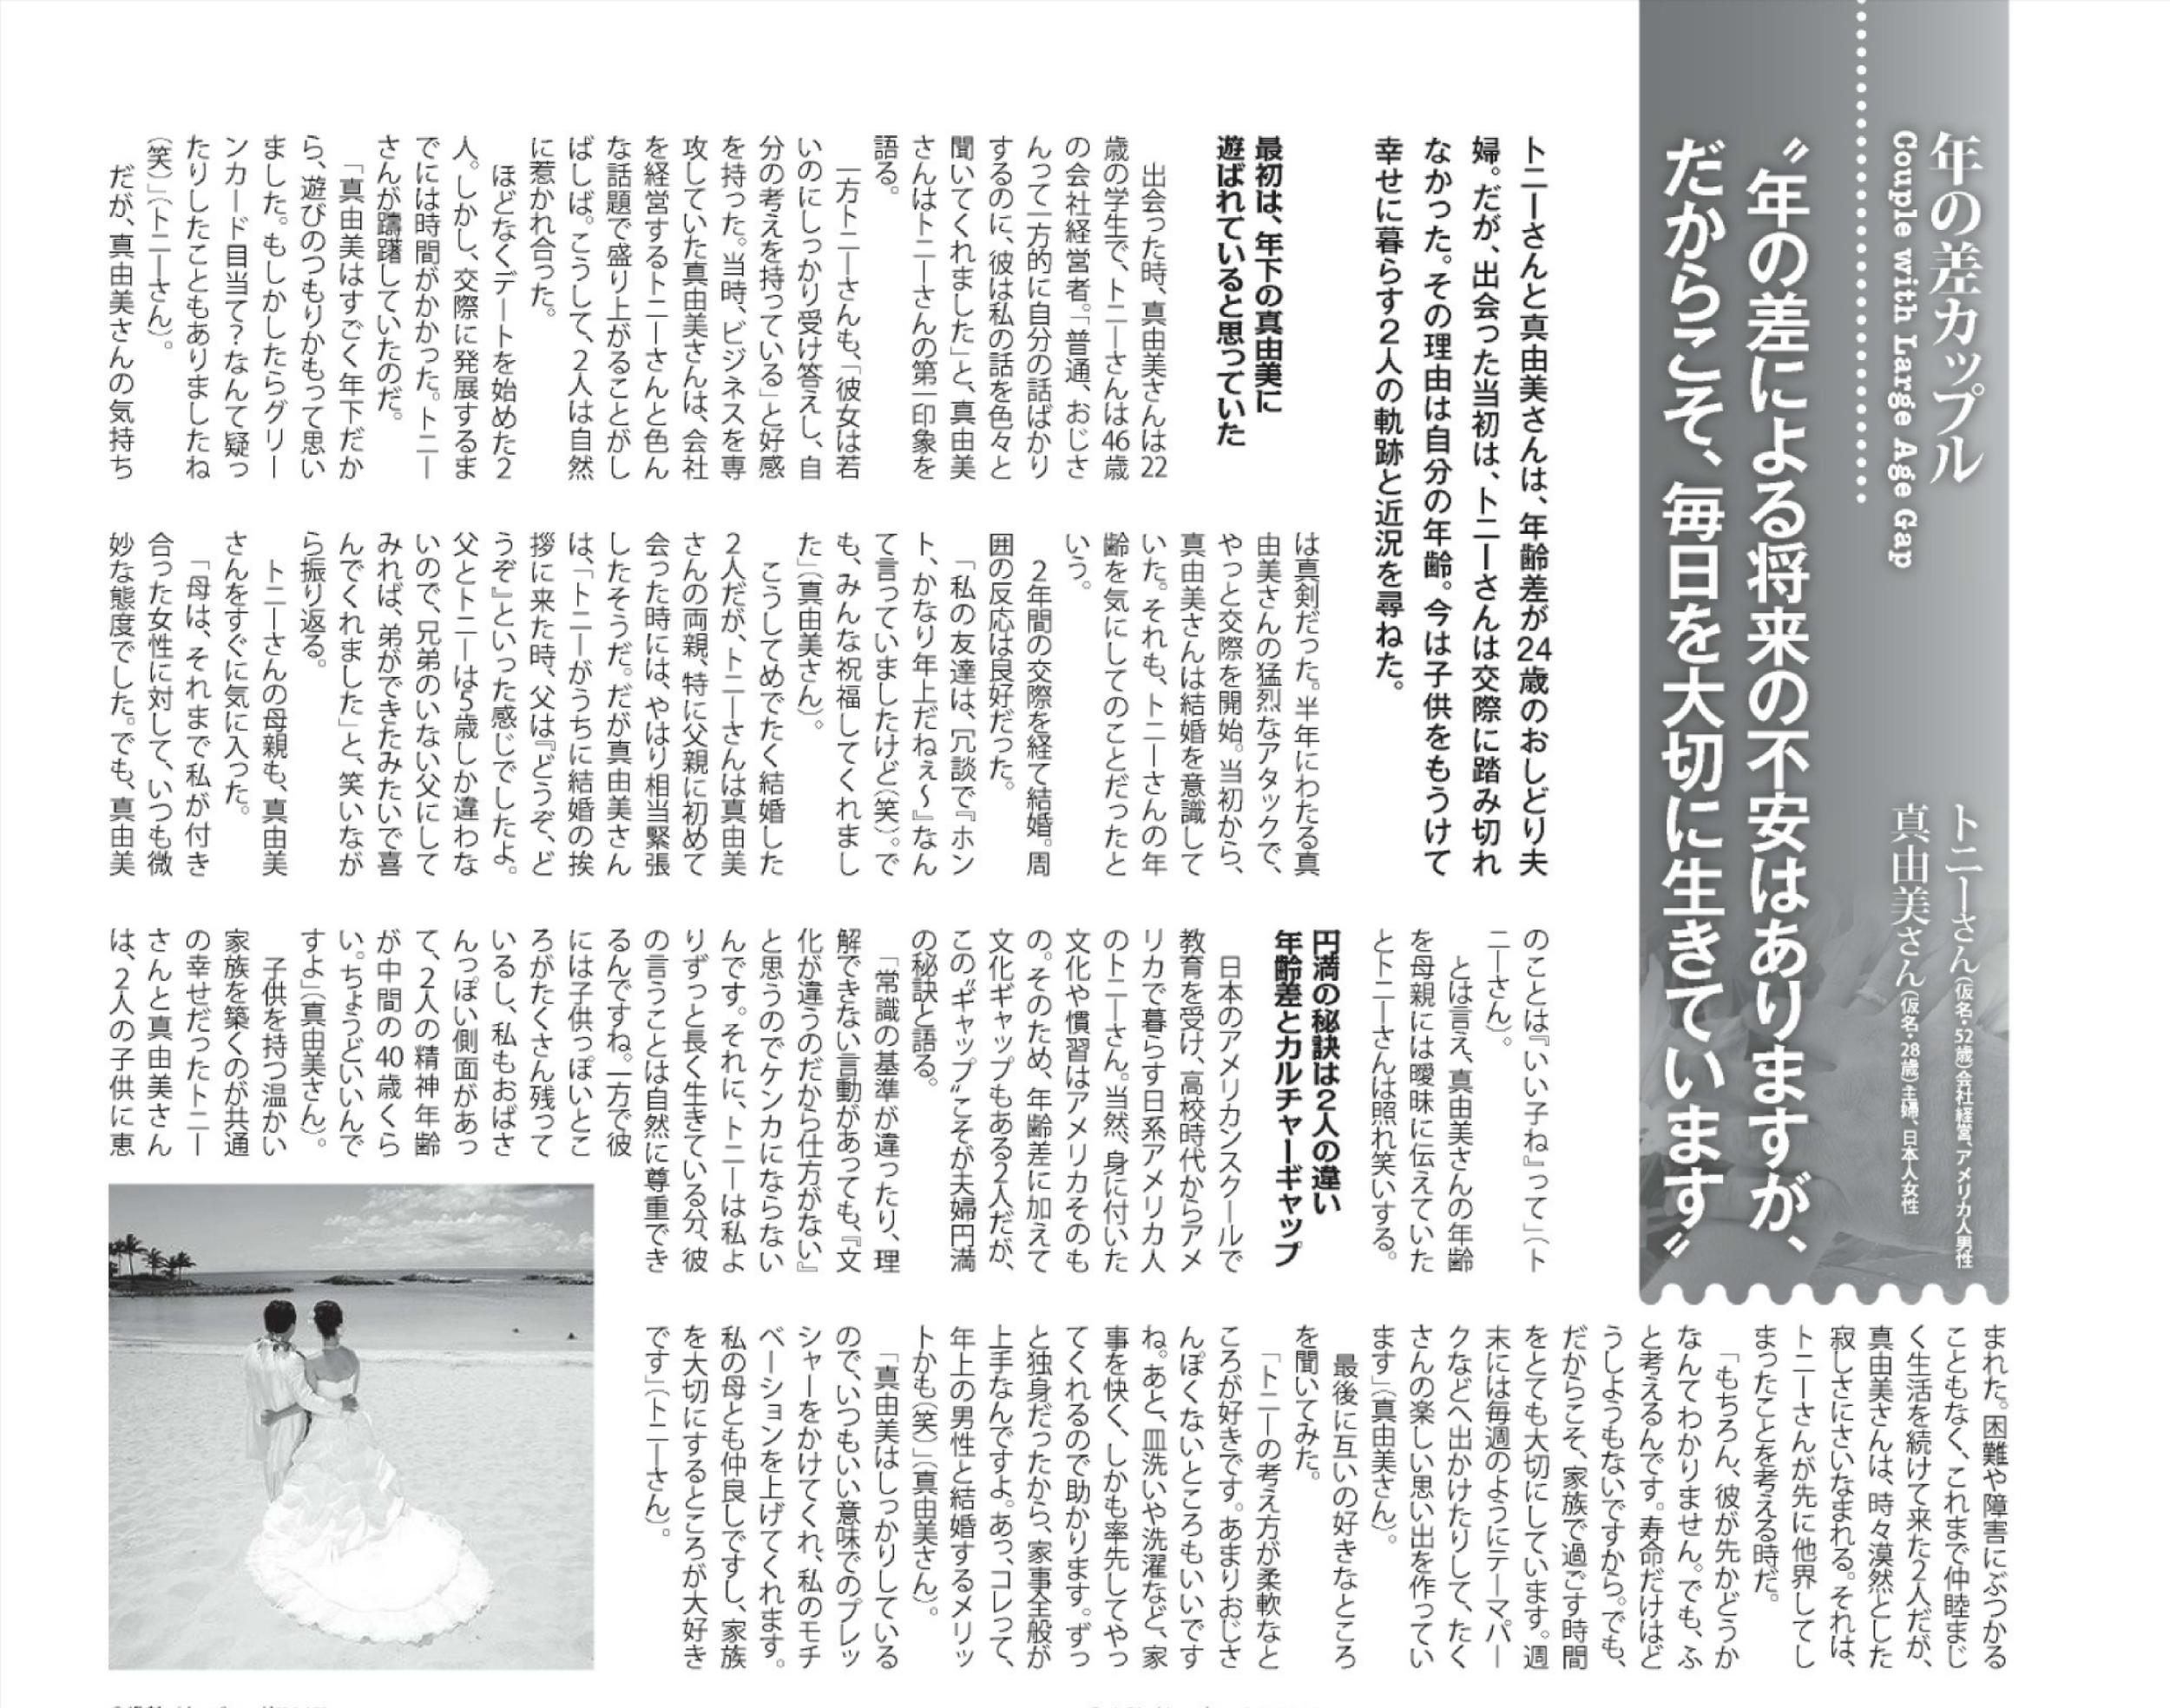 Lighthouse LA May 1, 2012 Page-1-4.jpg